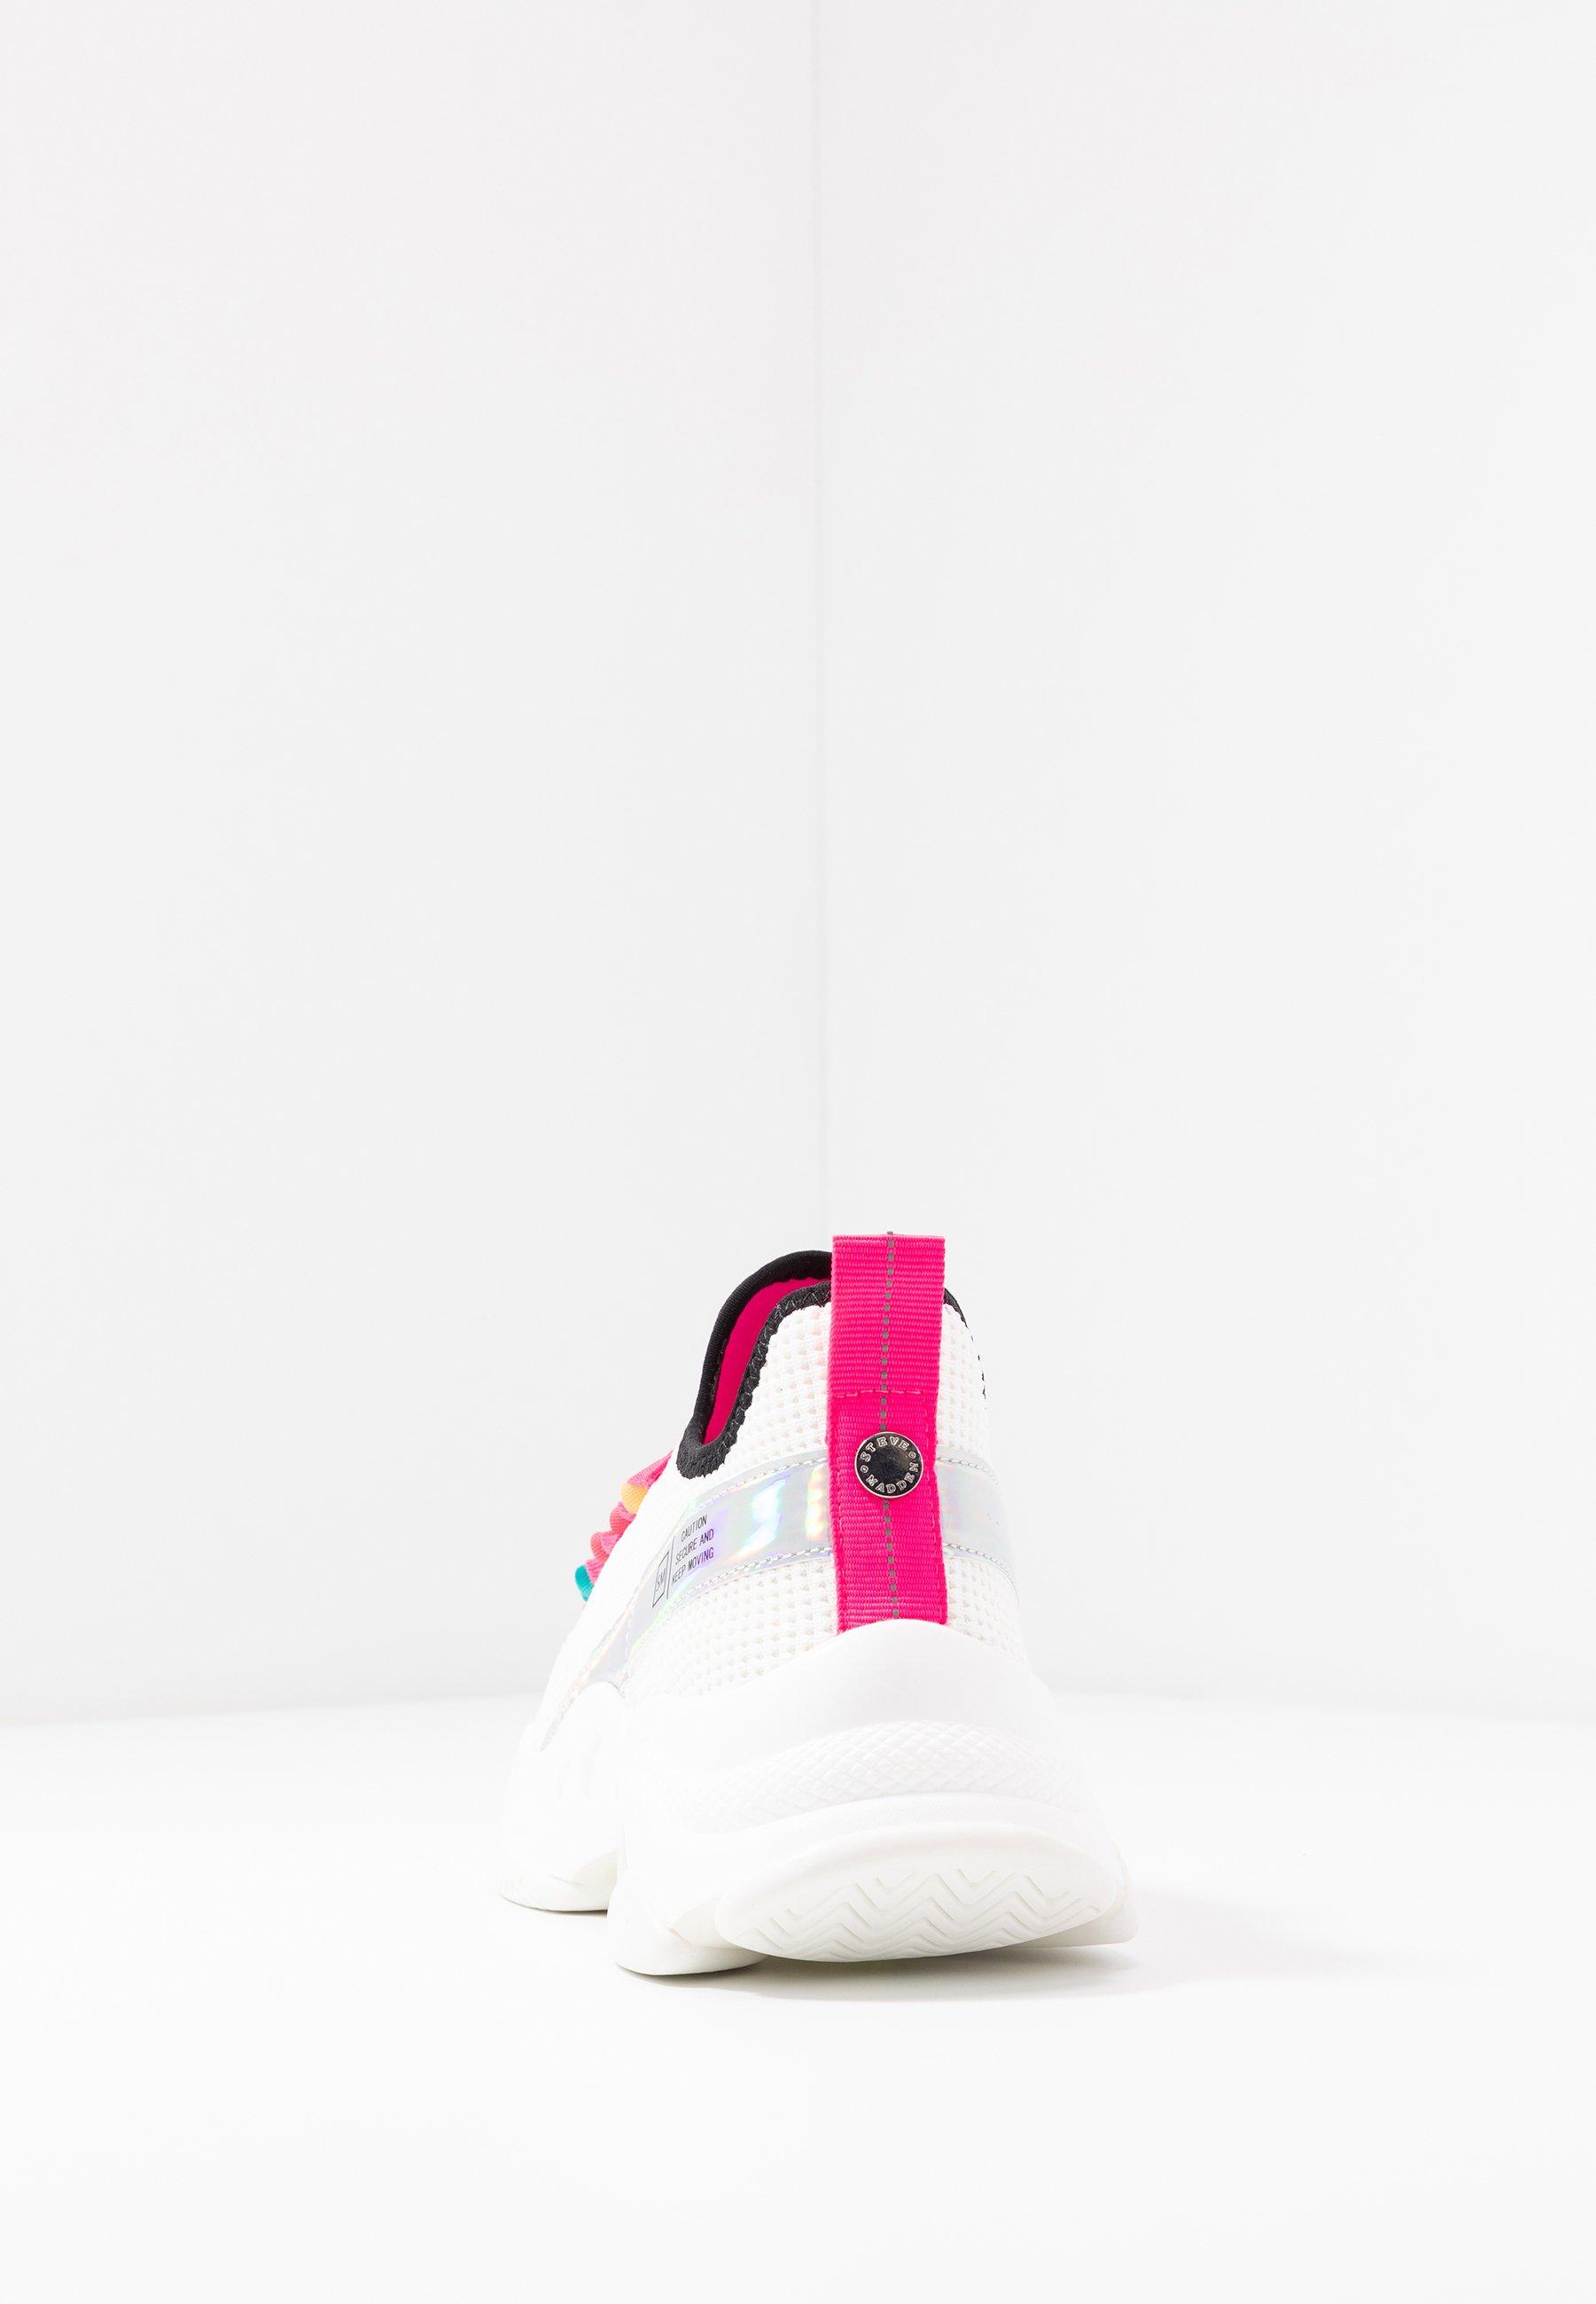 Steve Madden Sneakers - fuschia/multicolor